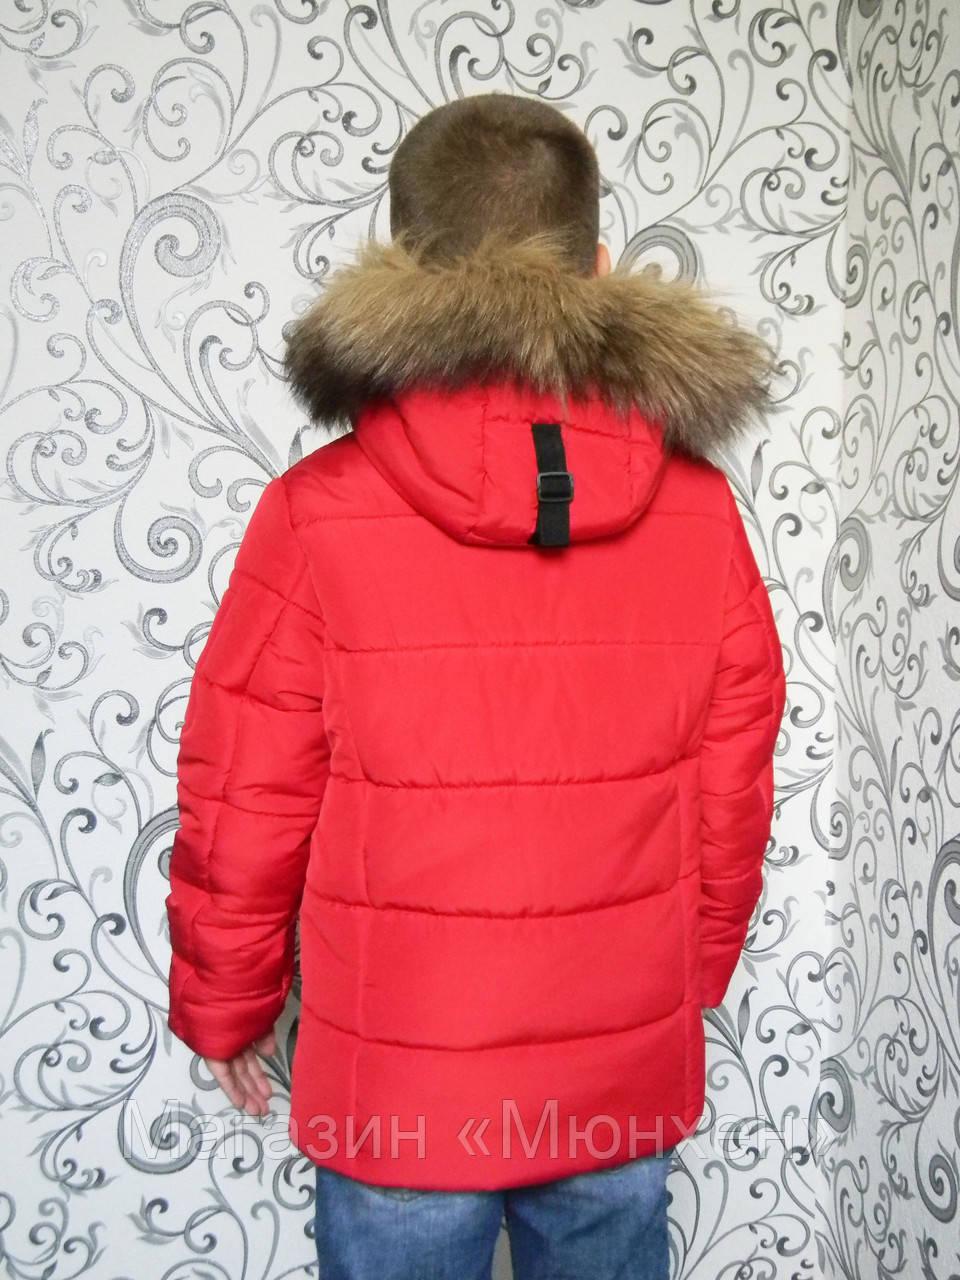 acbaeacb358 Зимняя Куртка